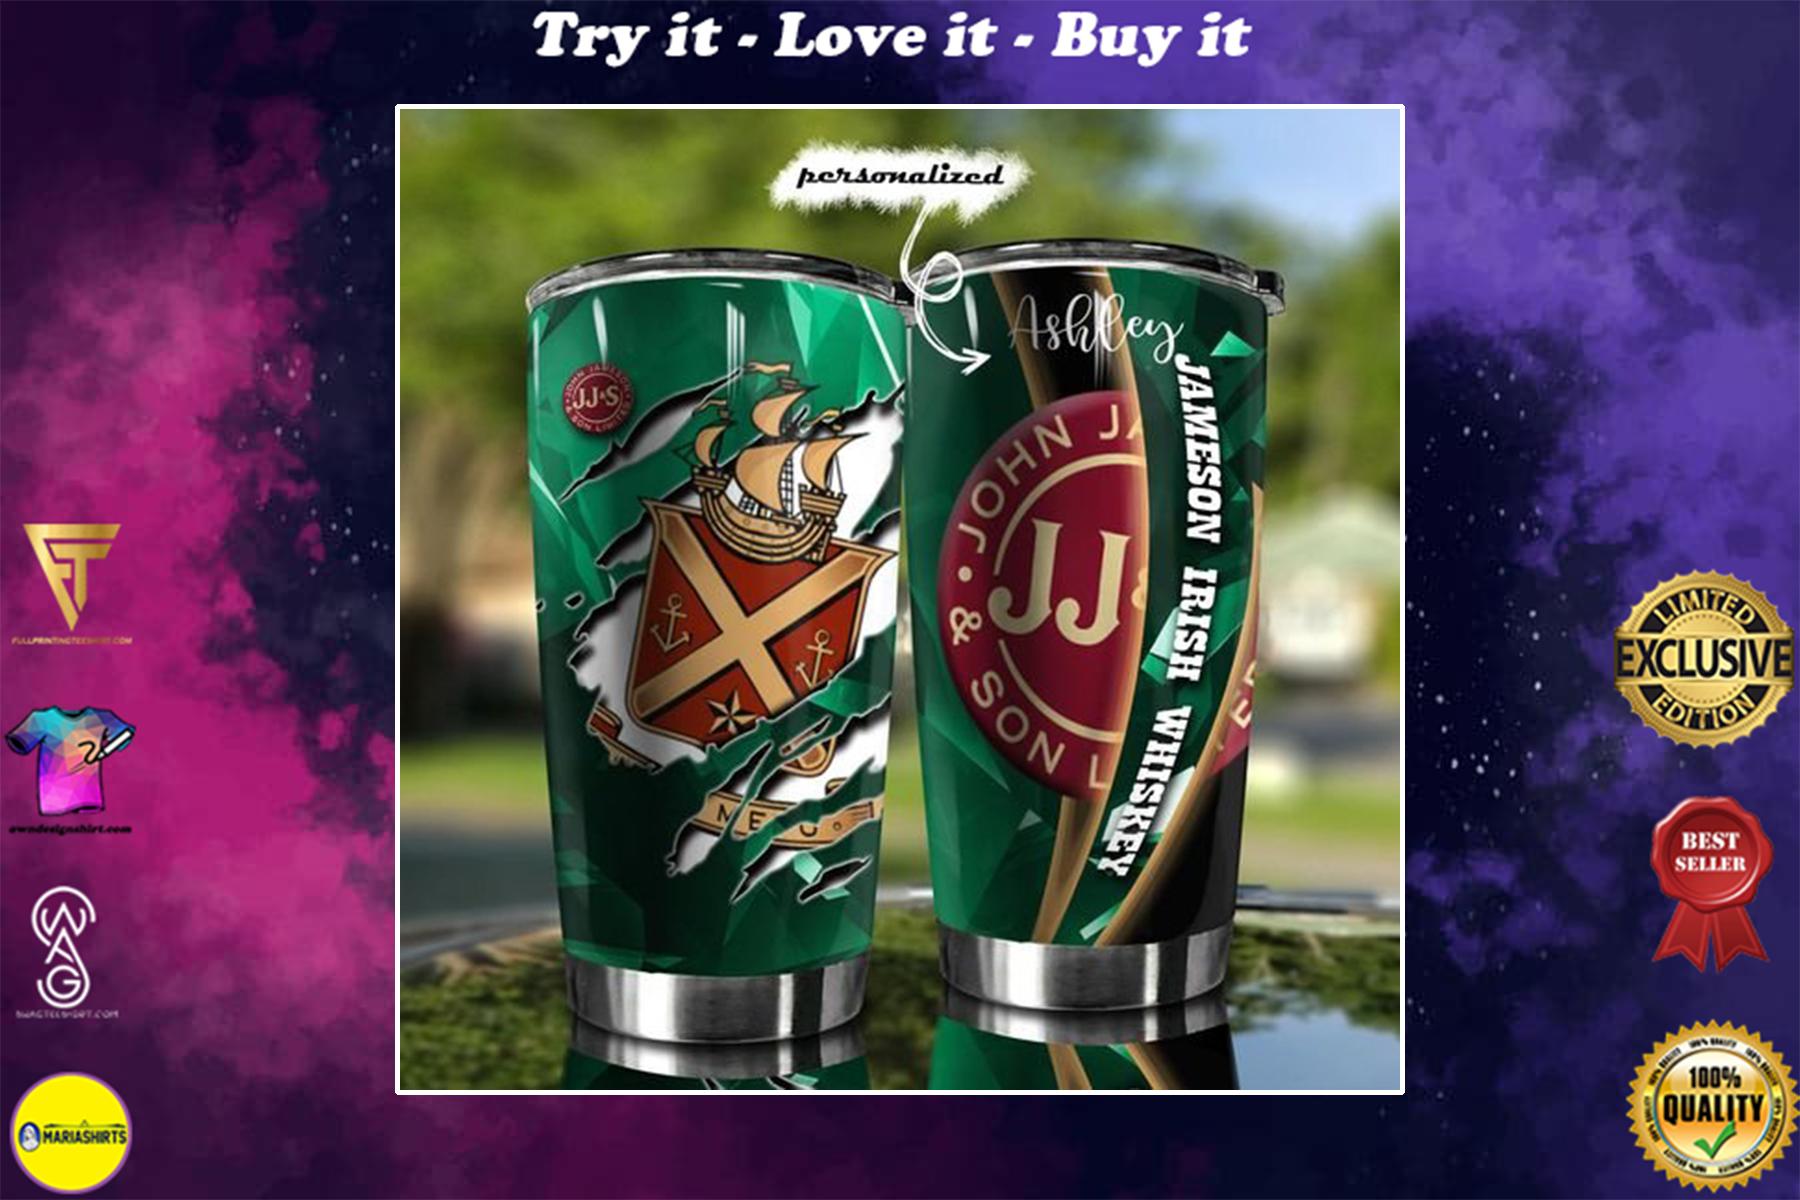 personalized name jameson irish whiskey tumbler